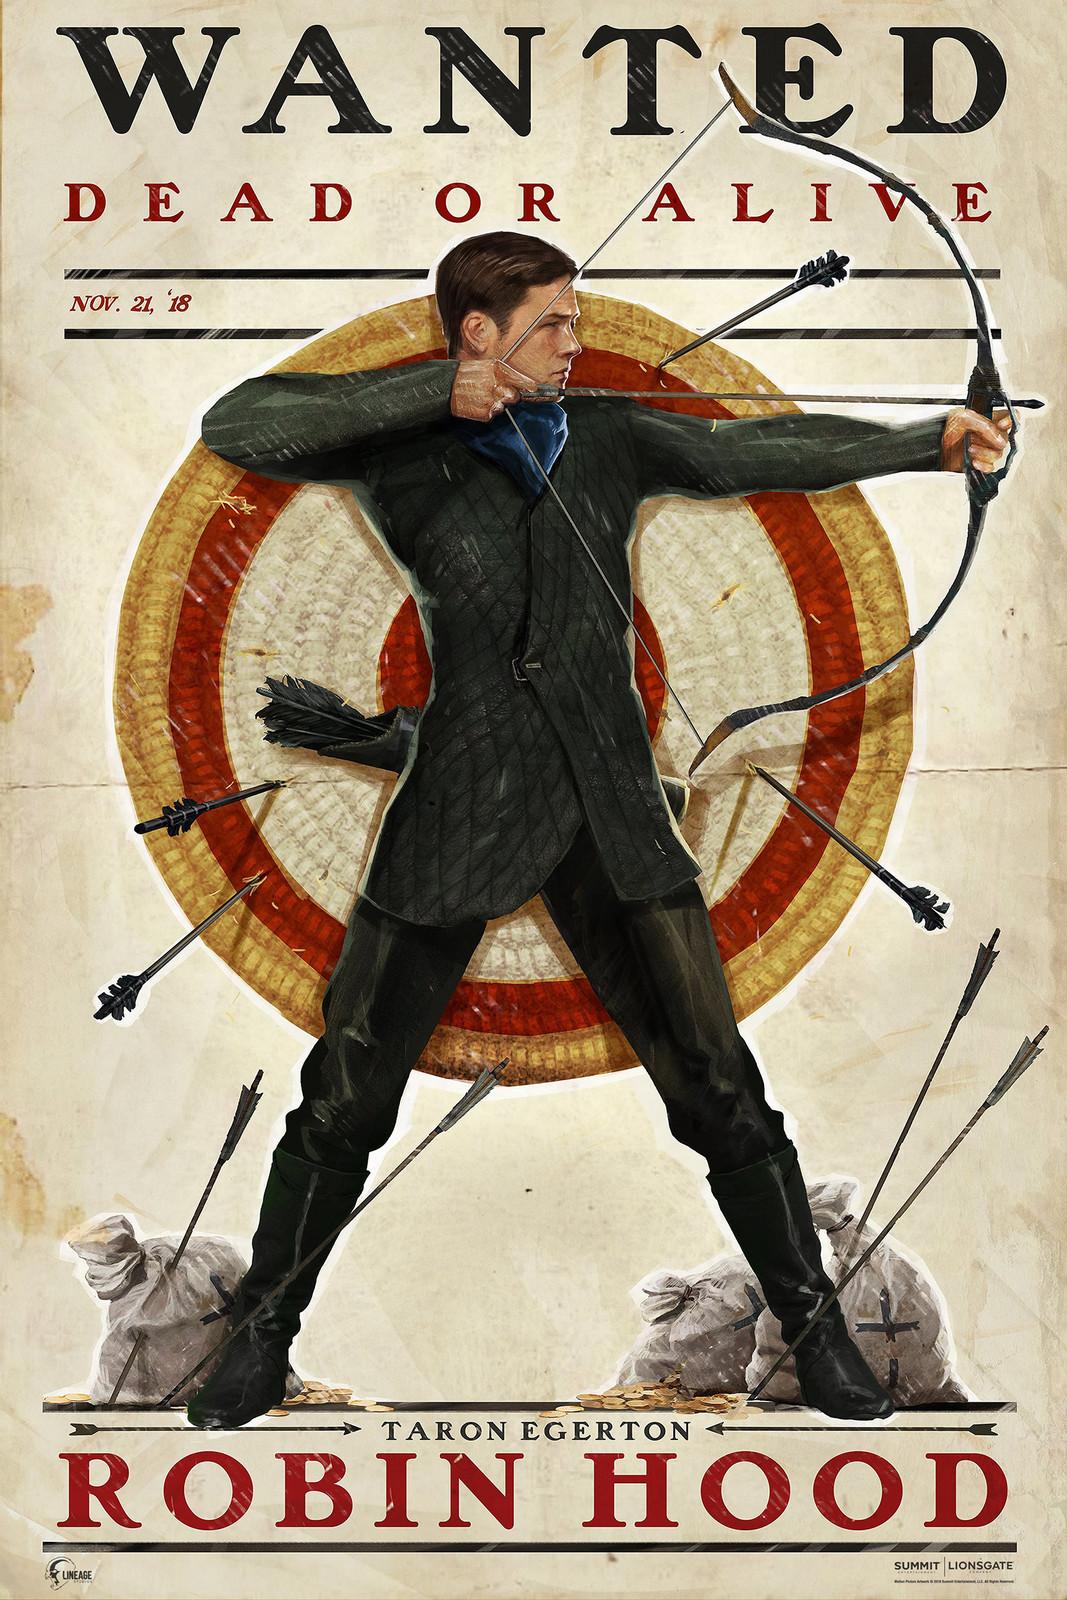 Robin Hood 2018 - Prints